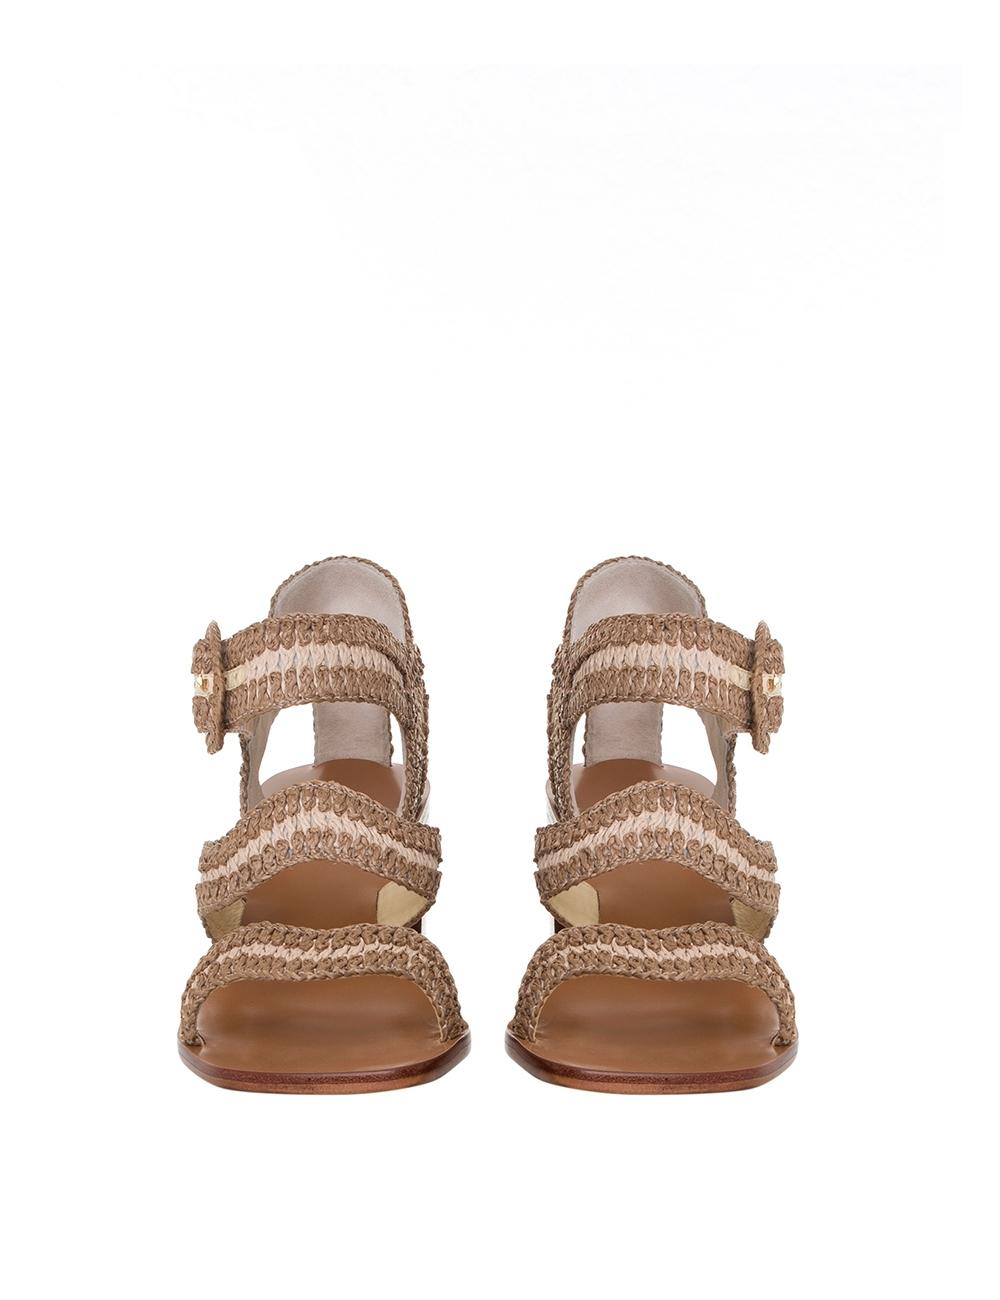 Wavy Raffia Heeled Sandal